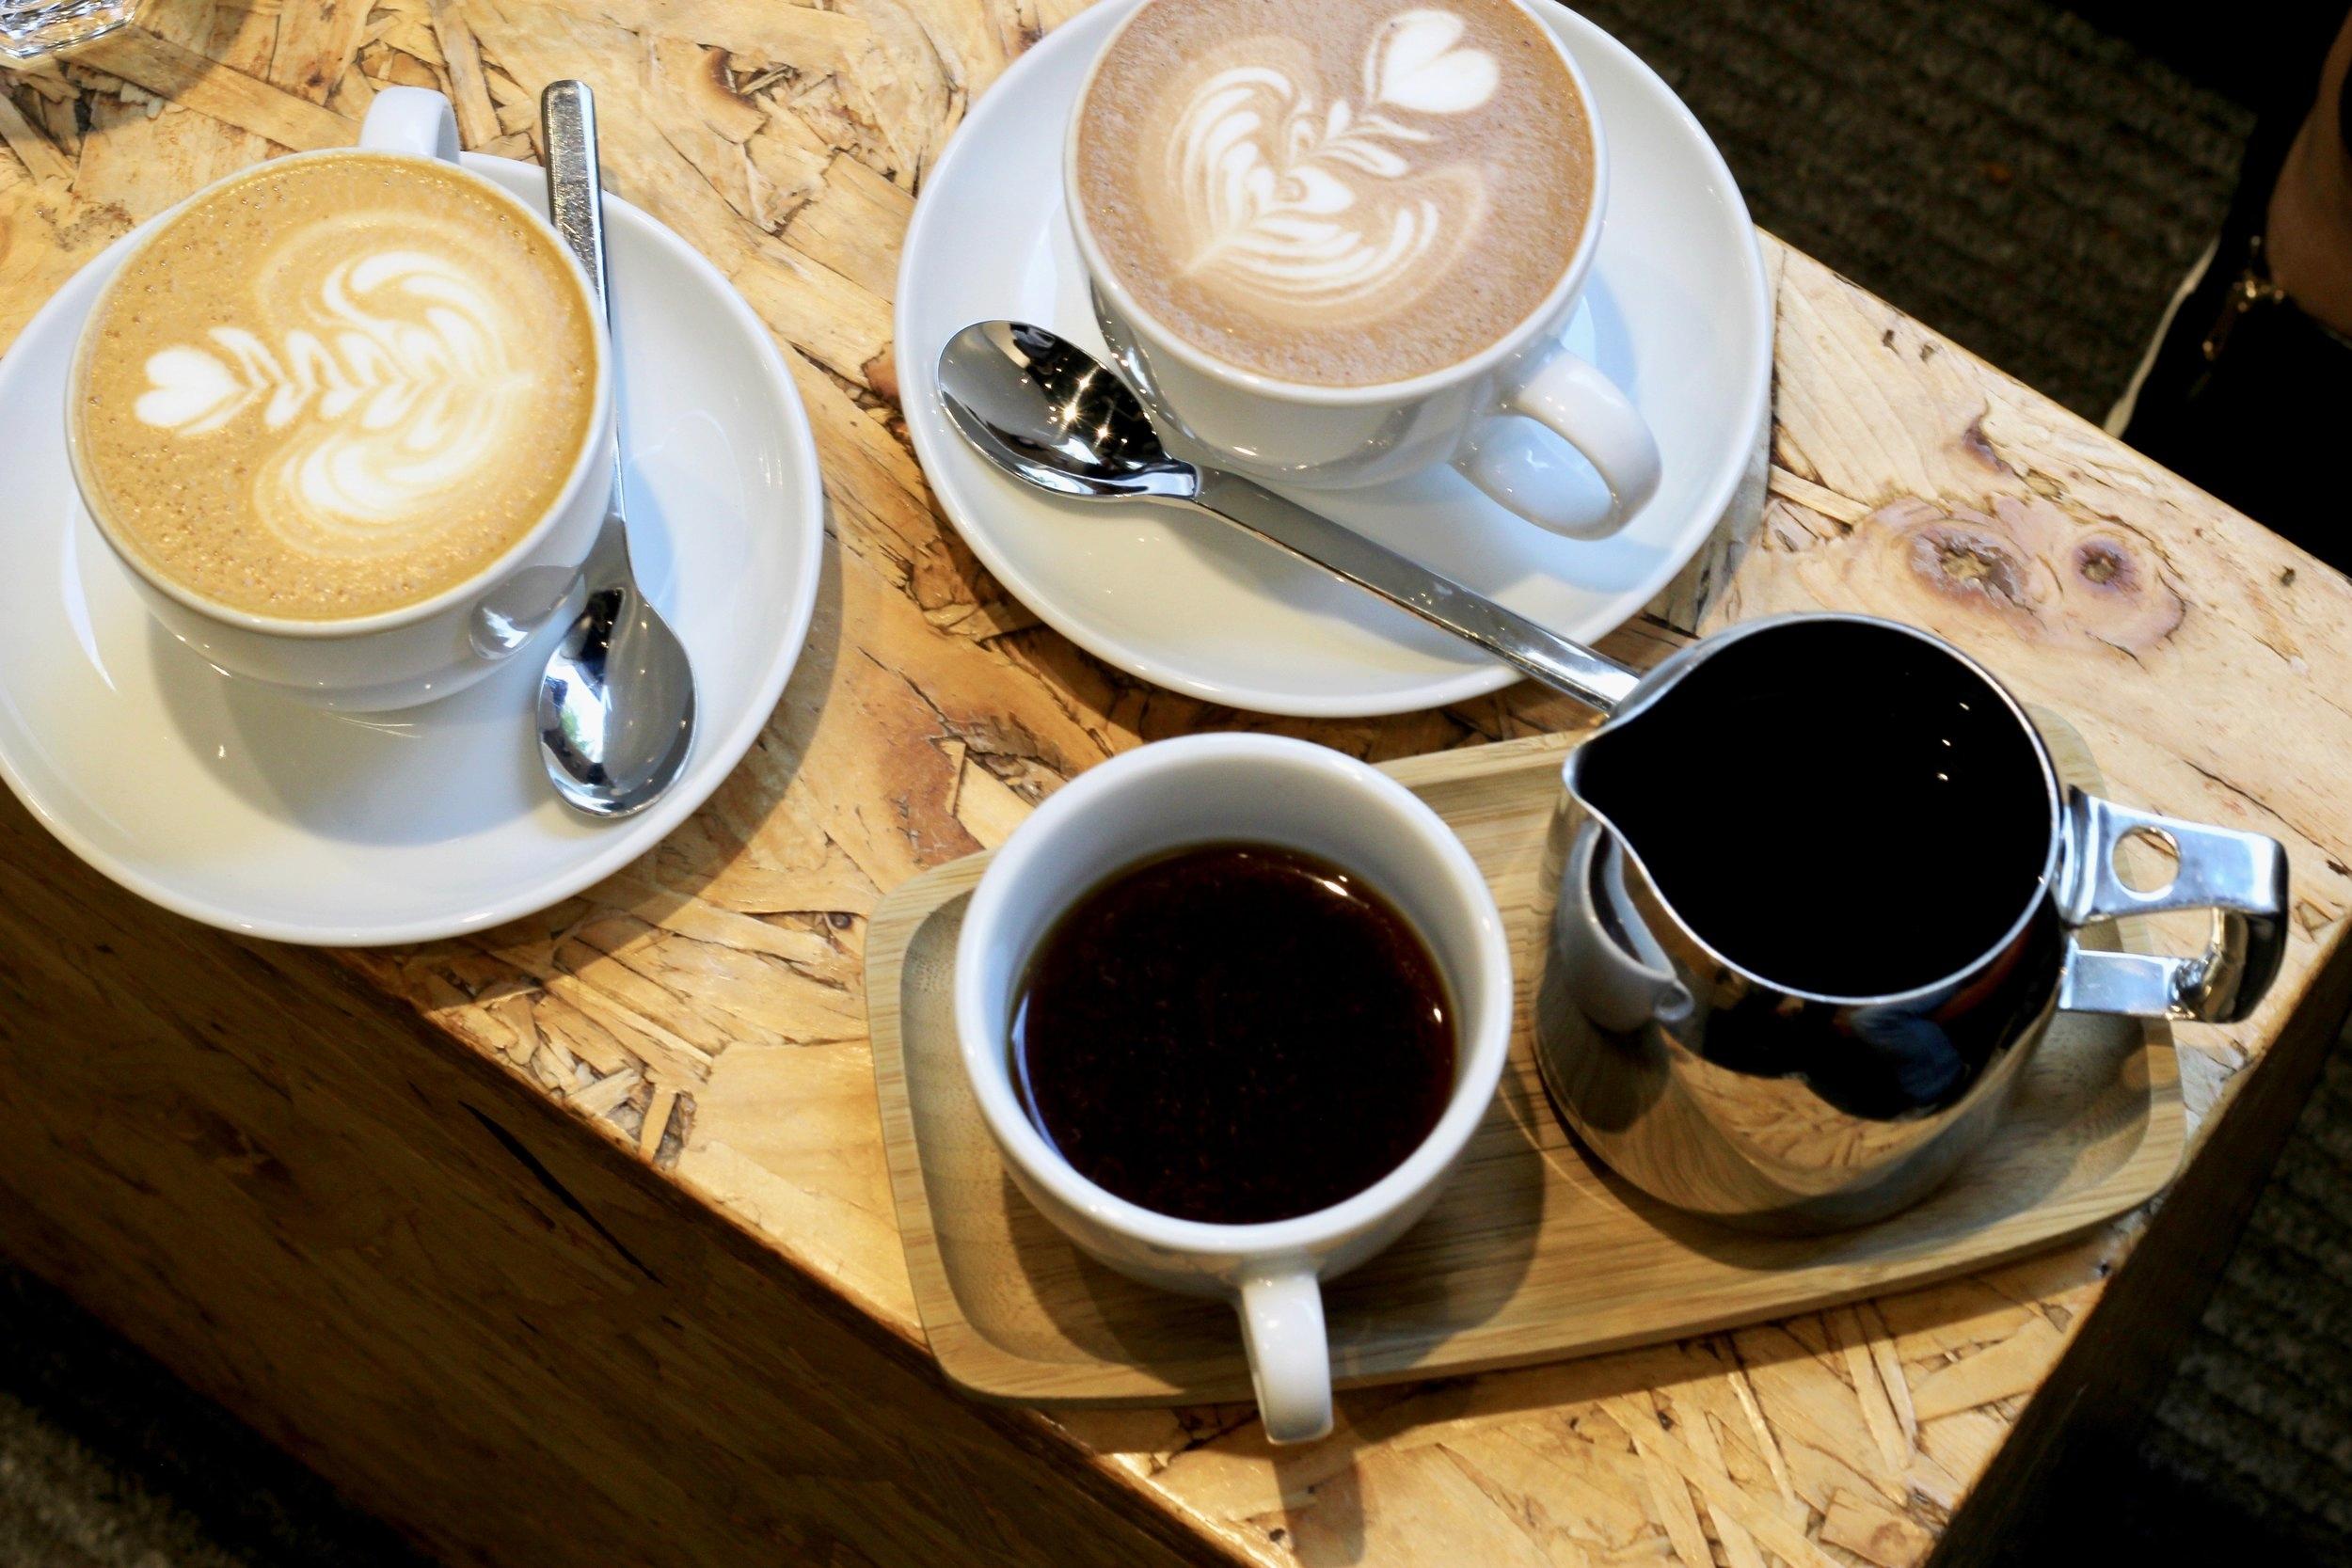 Latte, Mocha and filter coffee at   Workshop   Barrett Street, London.